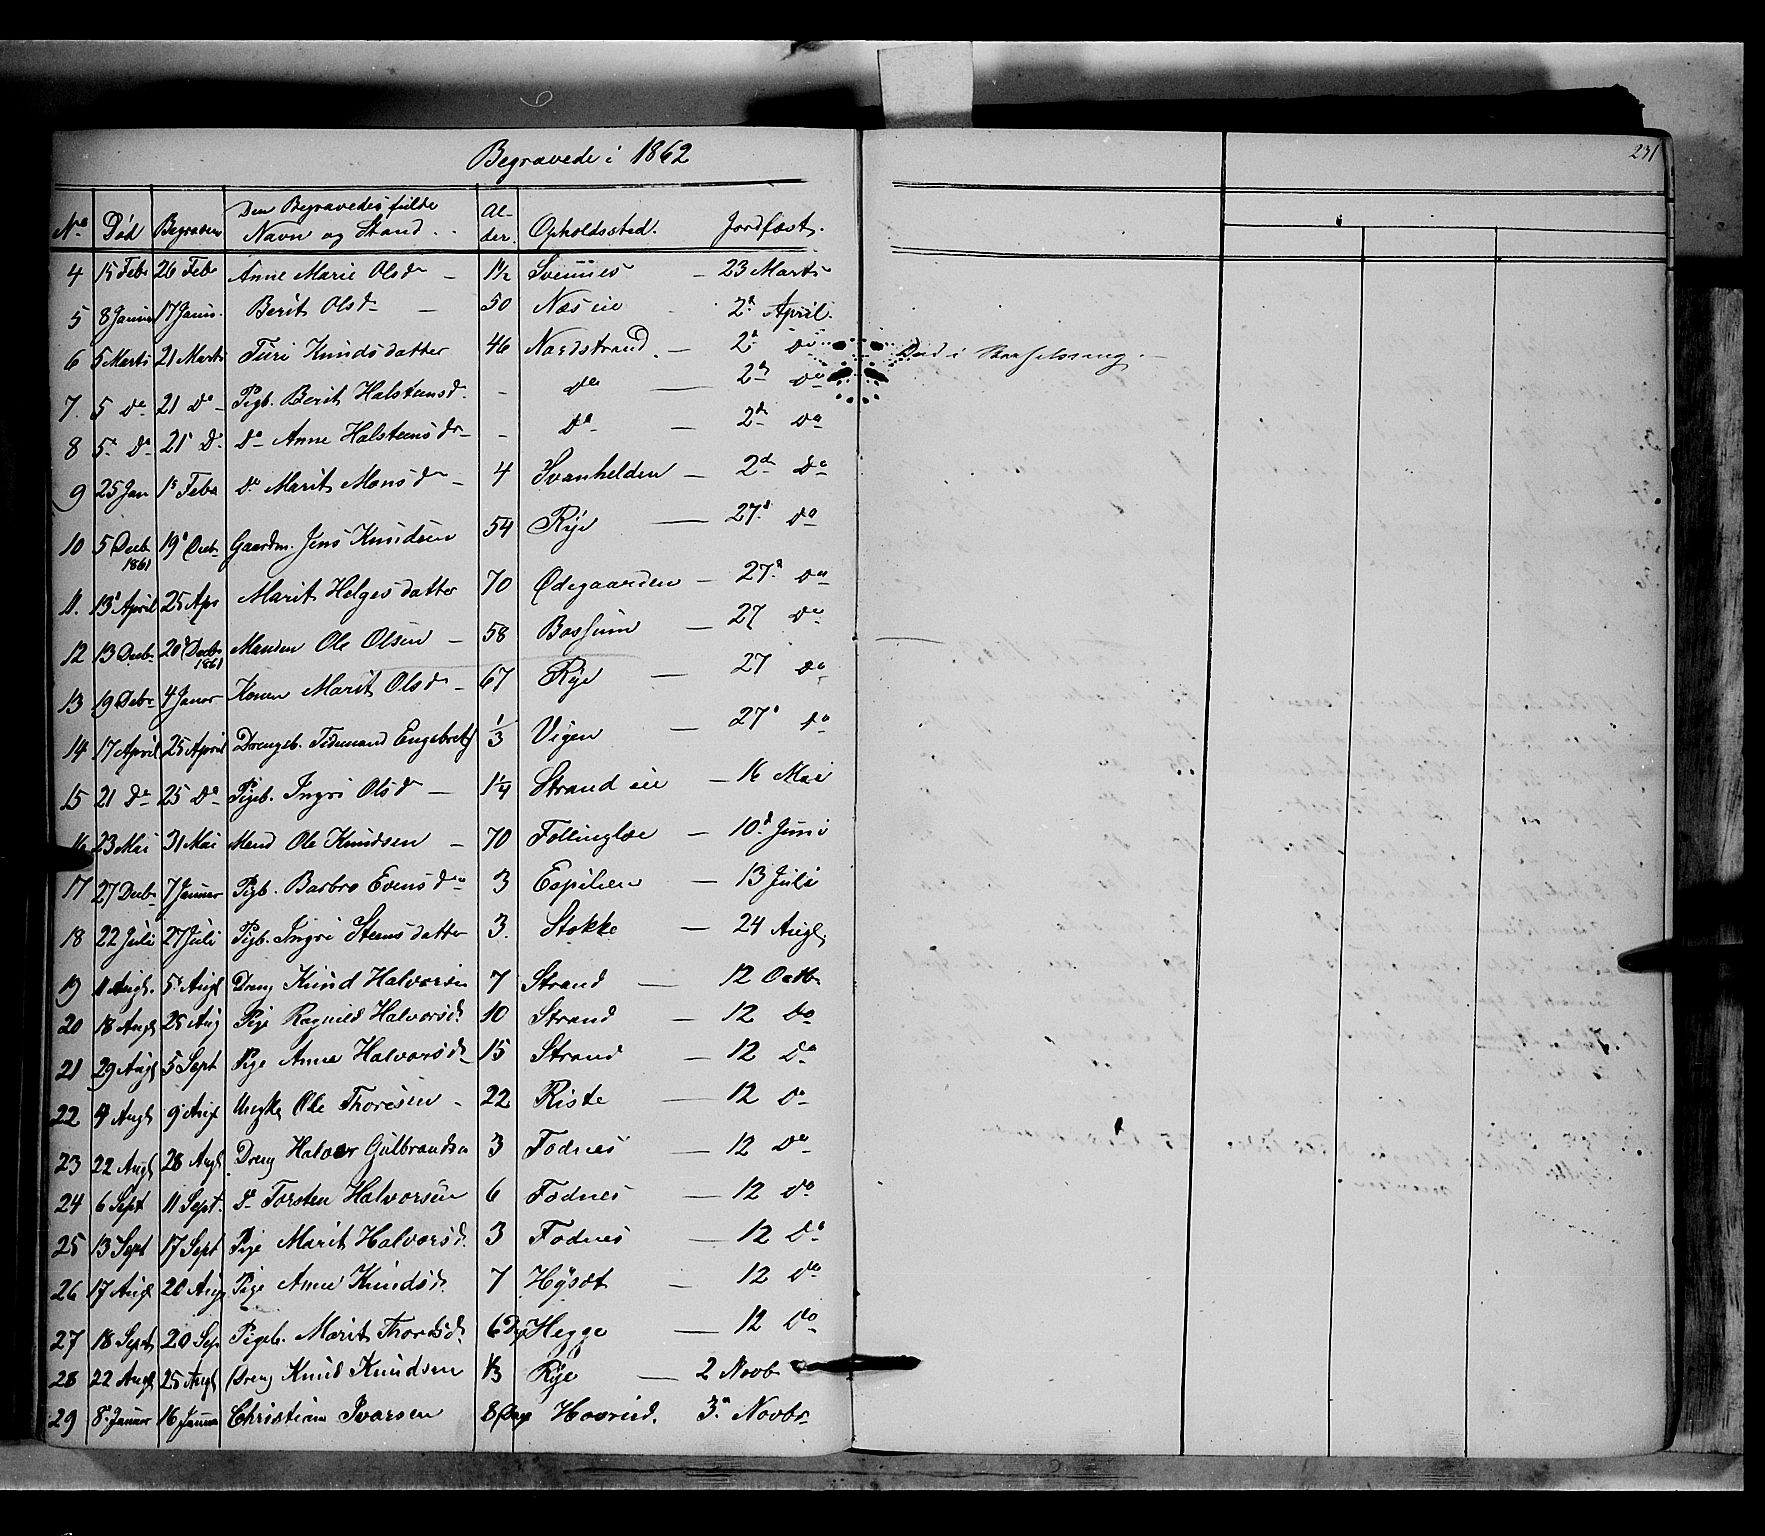 SAH, Nord-Aurdal prestekontor, Ministerialbok nr. 5, 1842-1863, s. 231